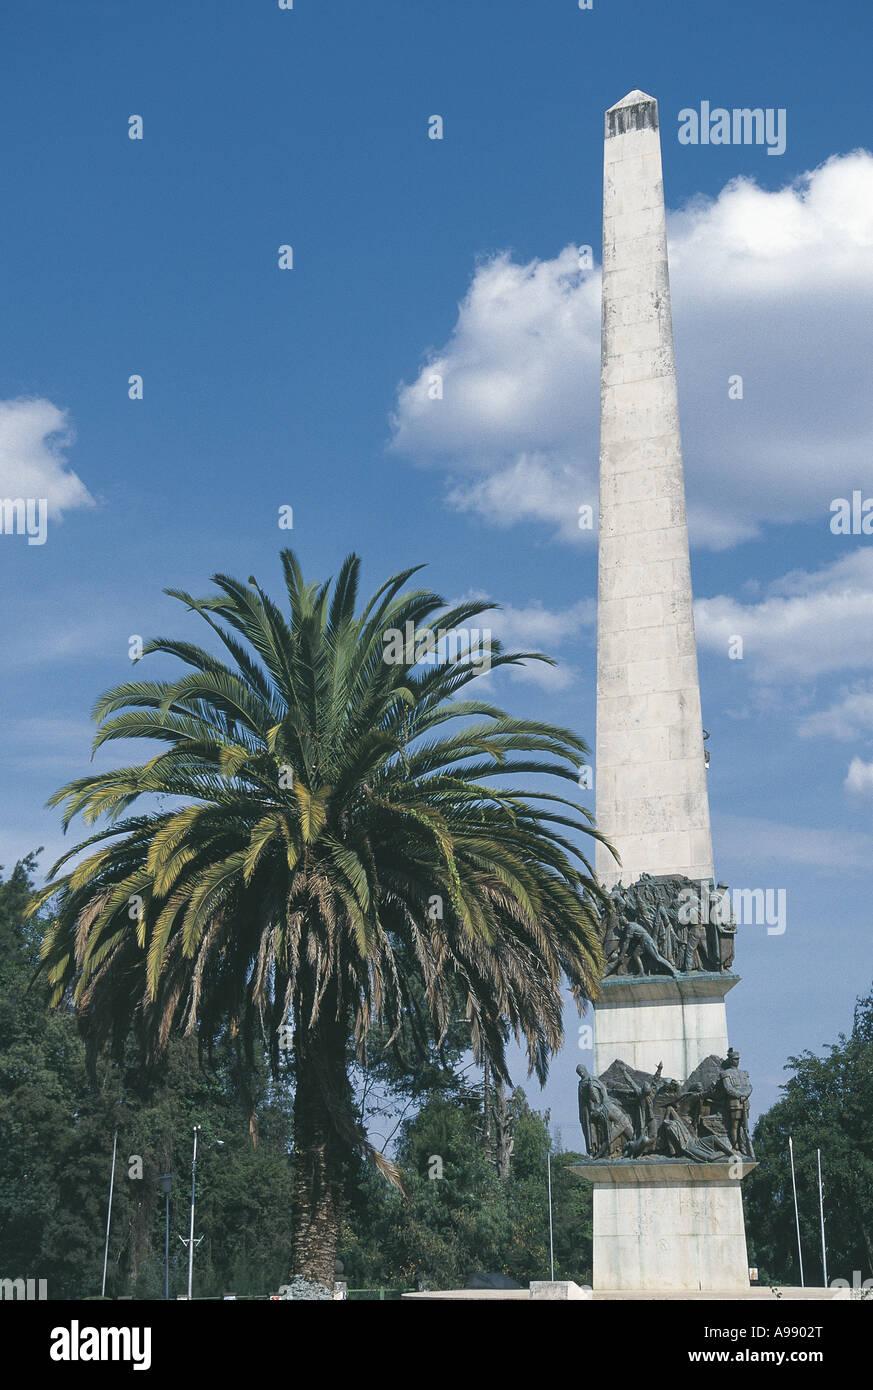 War monument at Sidist Kilo Addis Ababa Ethiopia - Stock Image